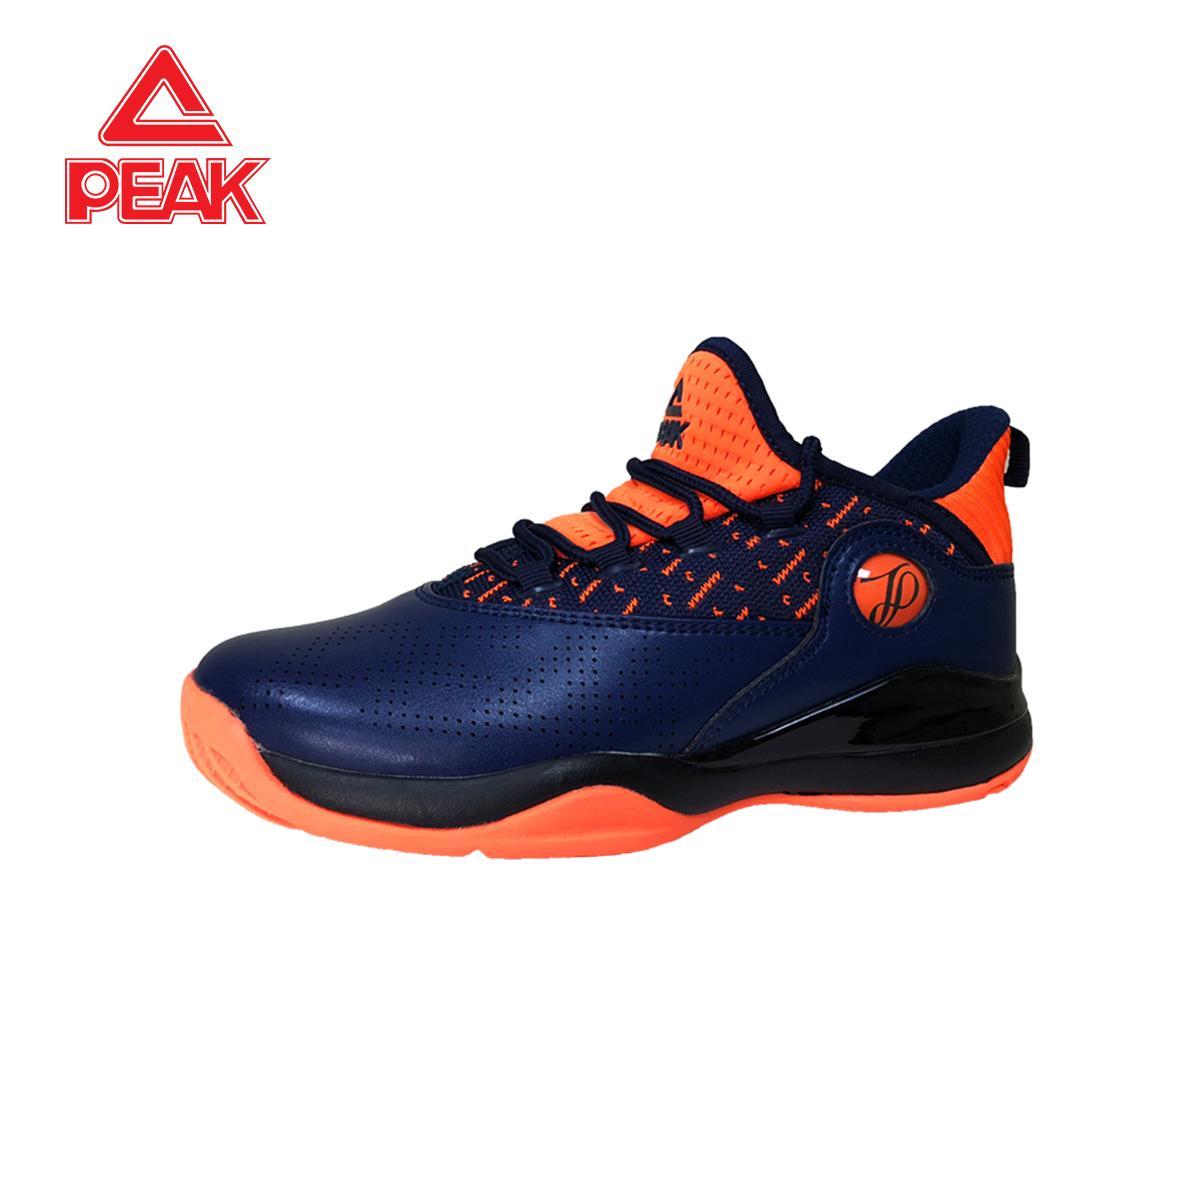 e1b635957a1 Peak Philippines  Peak price list - Peak Slippers   Sneakers for Men for  sale